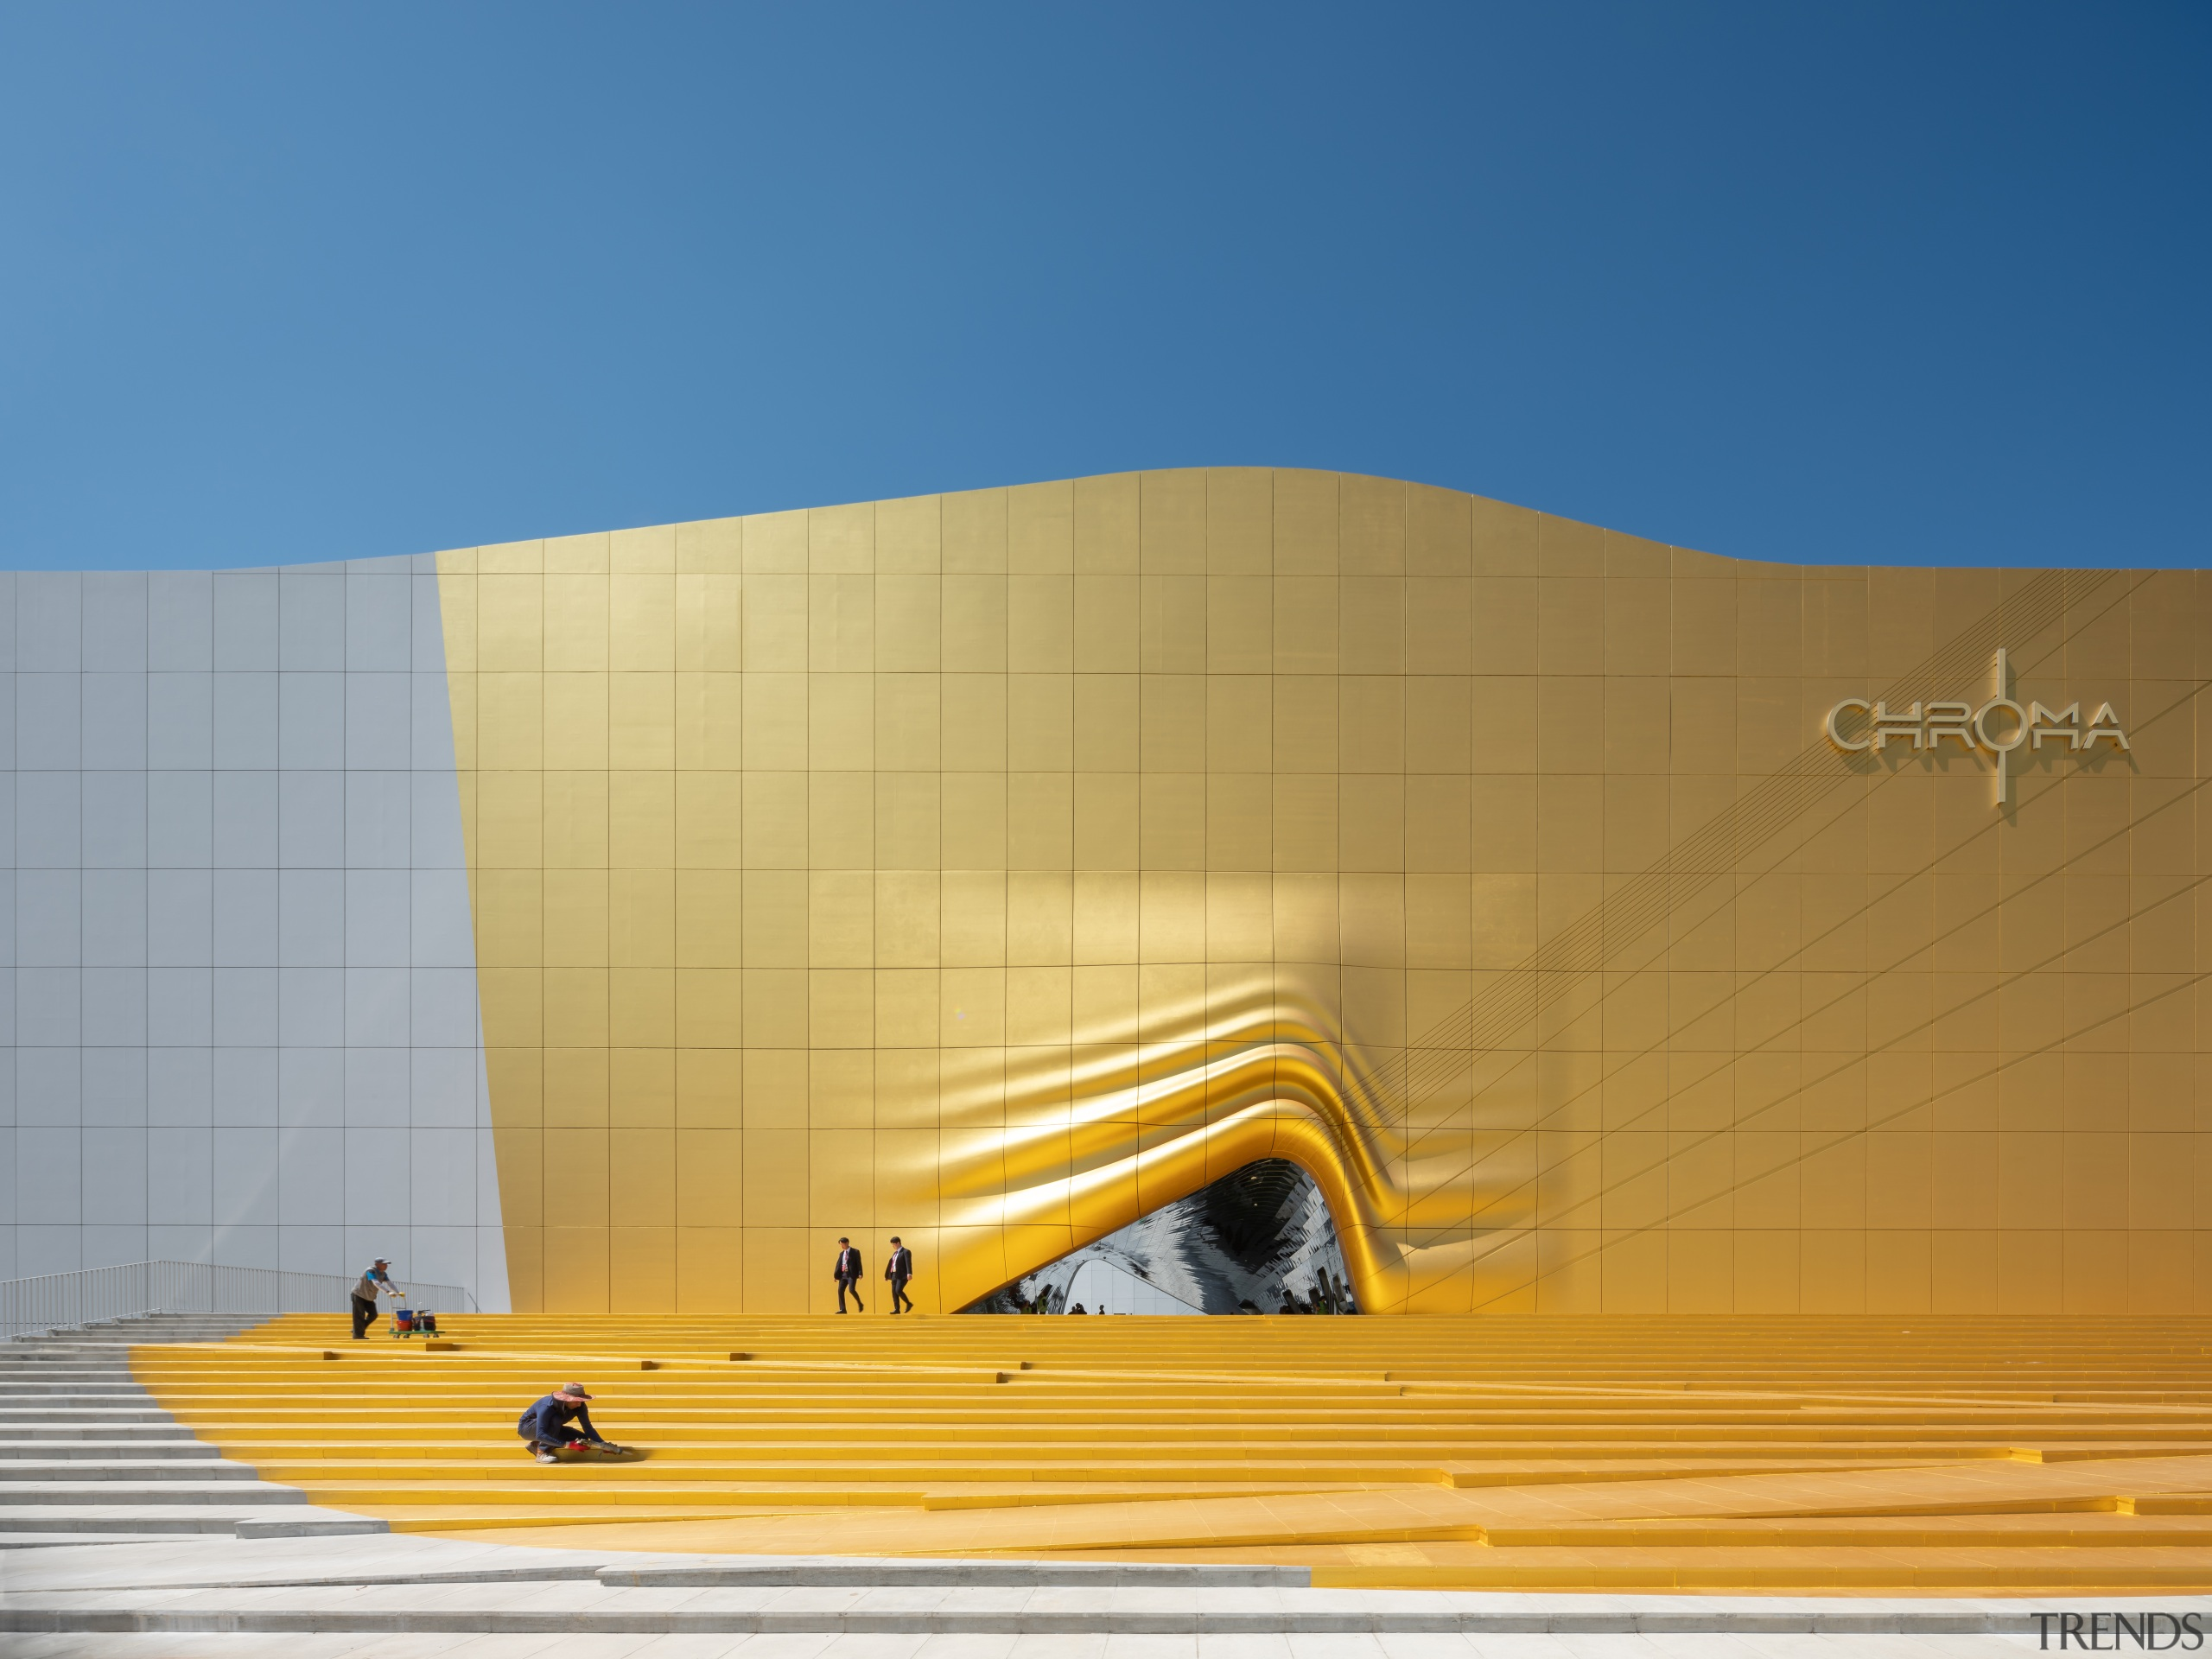 0994 - architecture | daylighting | daytime | architecture, daylighting, daytime, facade, line, sky, sunlight, wall, yellow, orange